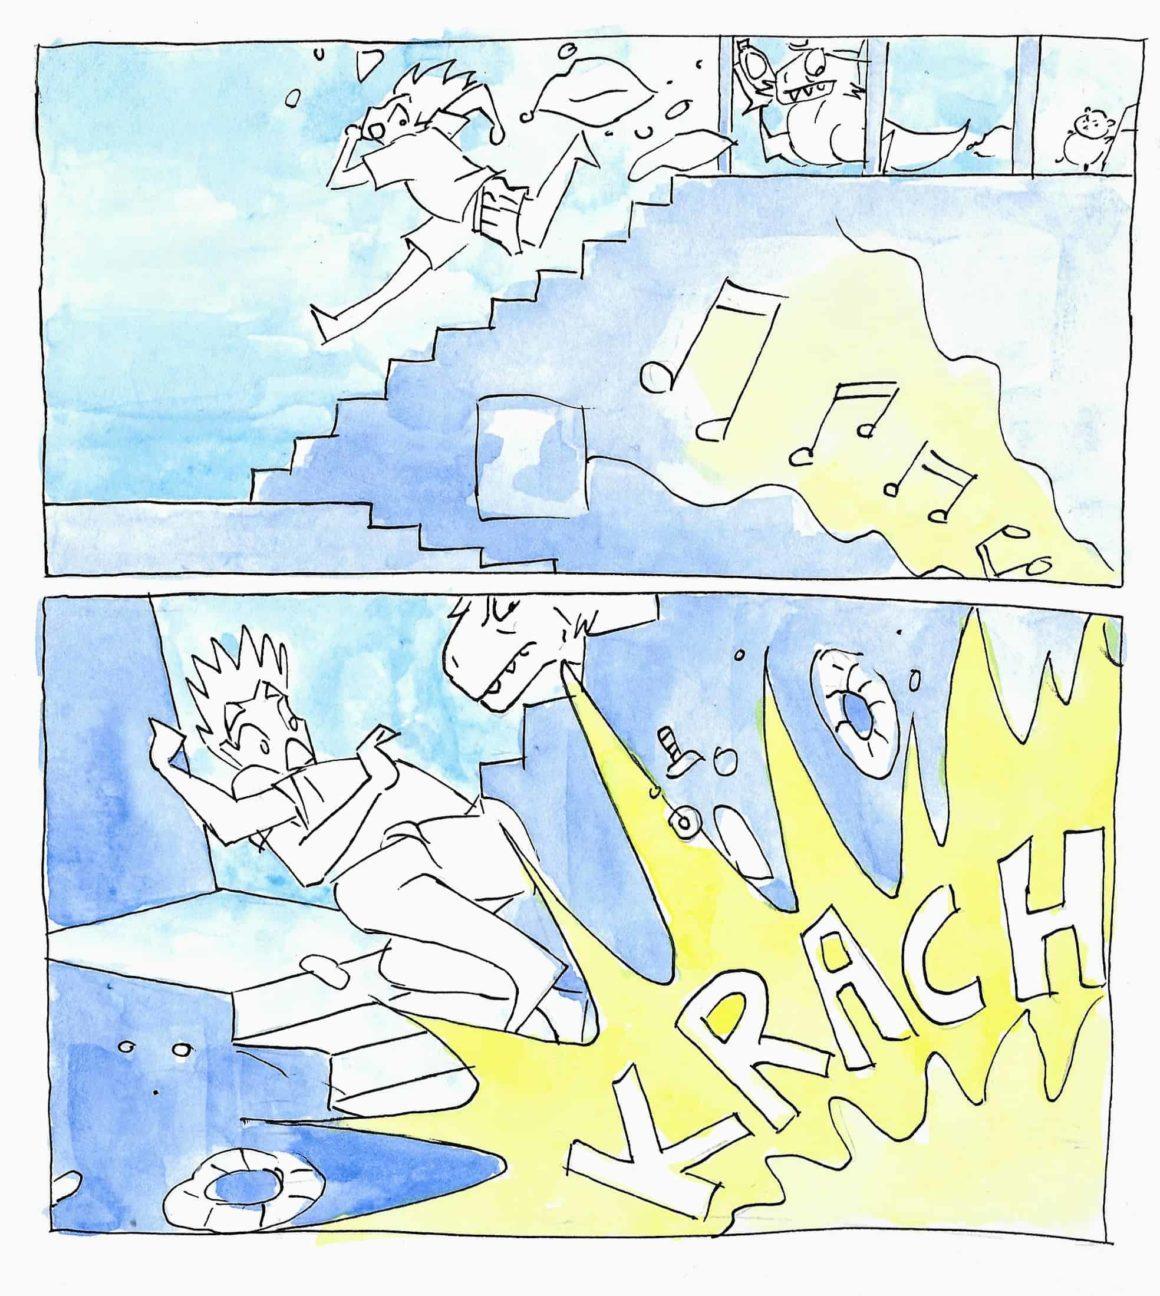 9. 3 1160x1296 - Sailor Moon Mom, oder: Dino Distancing #9